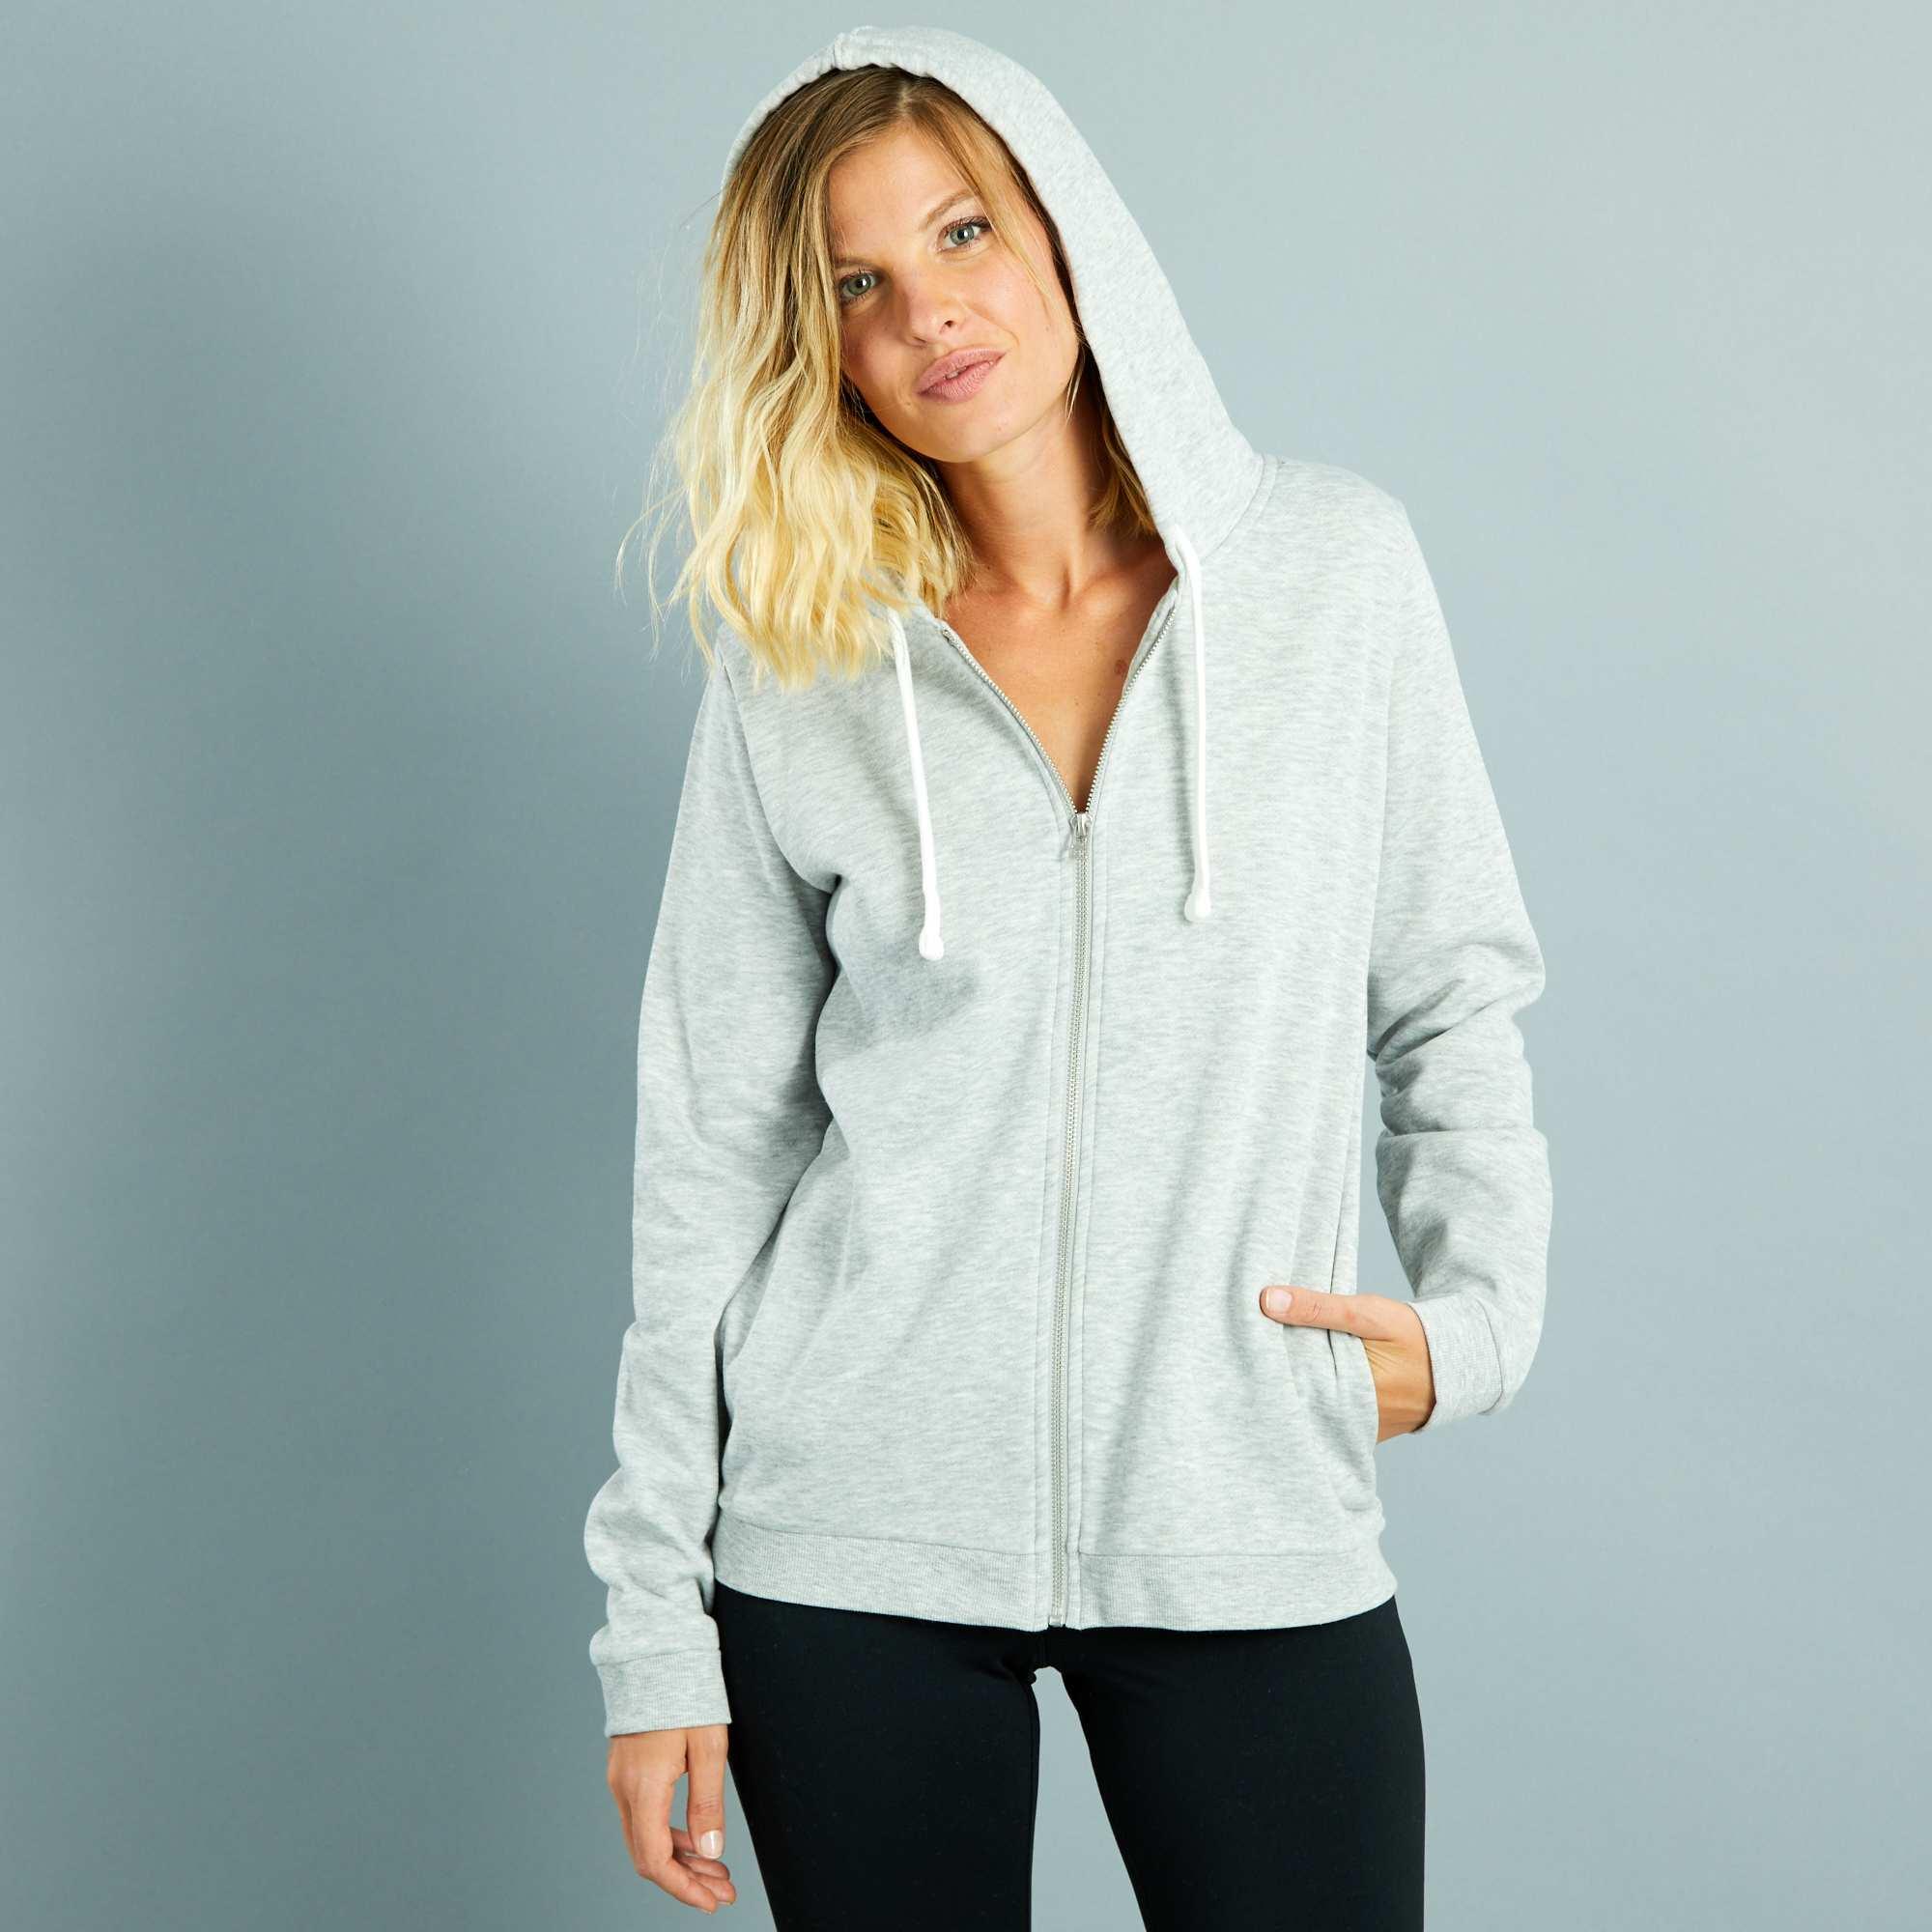 sweat zipp capuche en molleton l ger femme gris chin clair kiabi 10 00. Black Bedroom Furniture Sets. Home Design Ideas